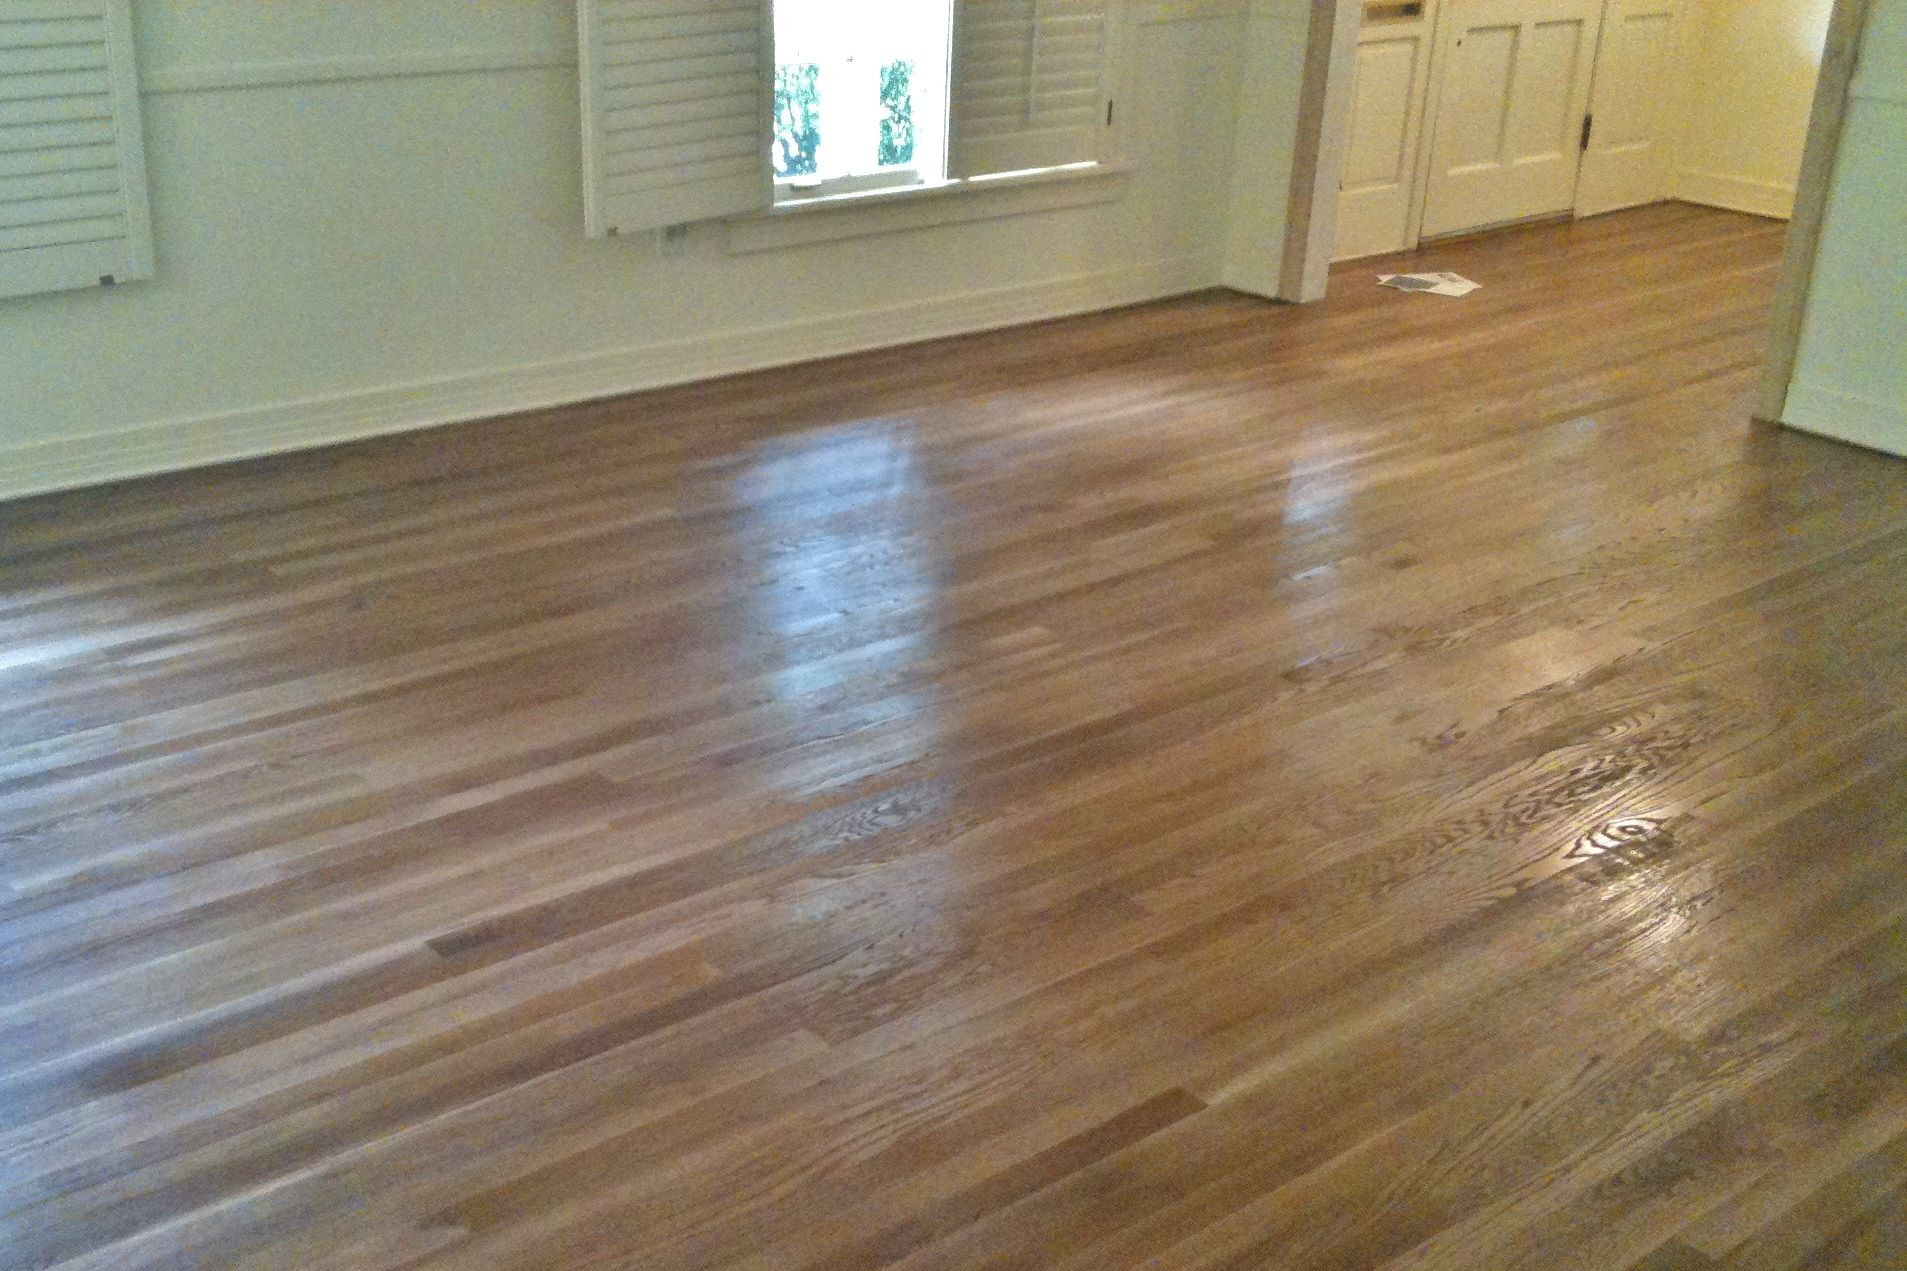 hardwood floor refinishing lincoln ne of wood floor refinishing hardwood floor repair floor plan ideas throughout minwax special walnut stain on oak hardwood floors